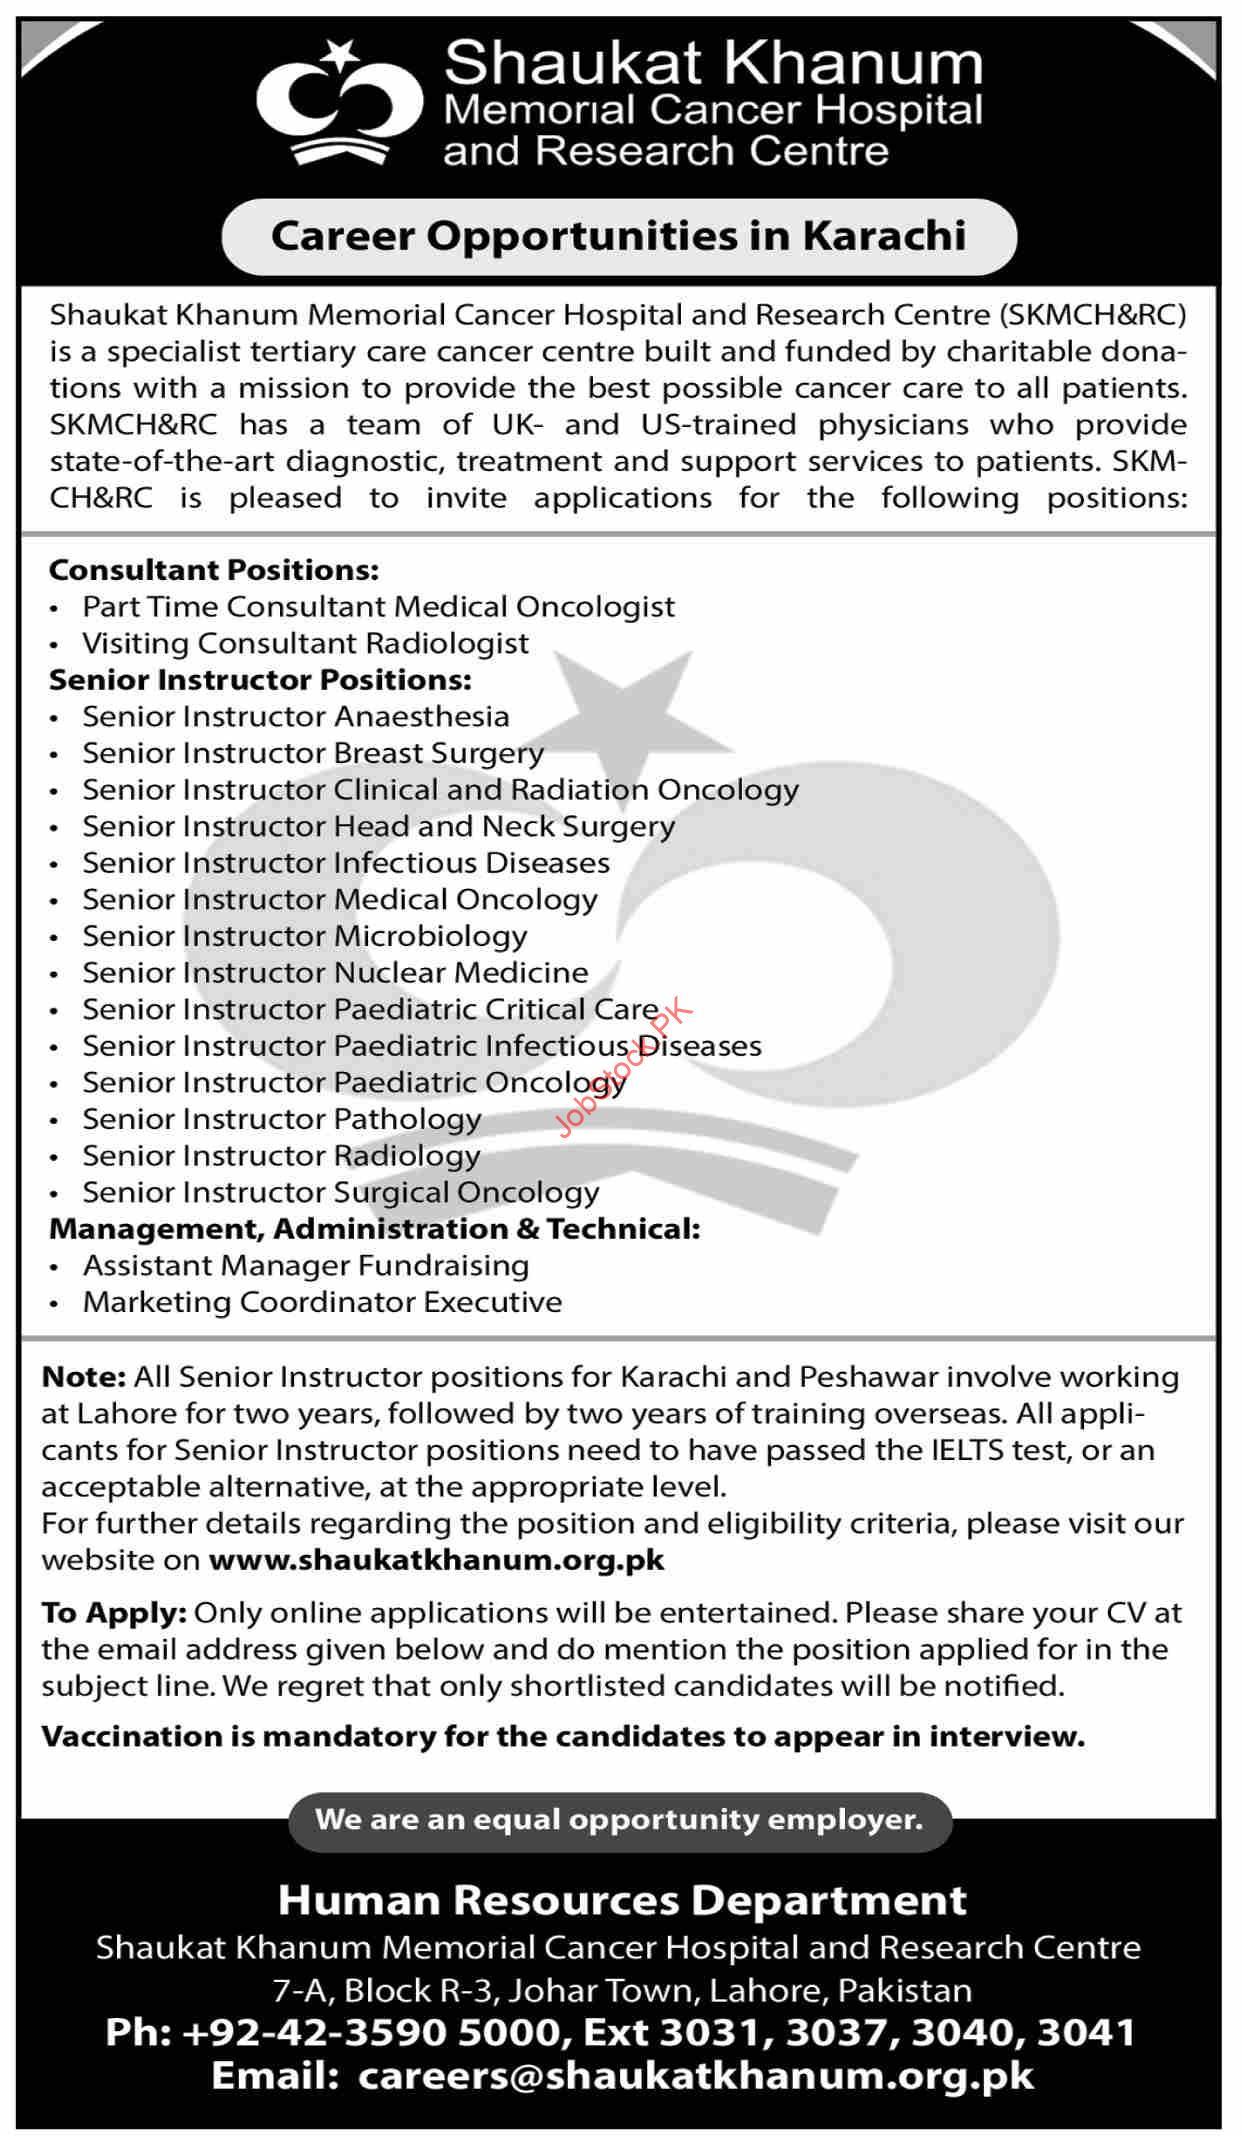 Shaukat Khanum Cancer Hospital Jobs 2021